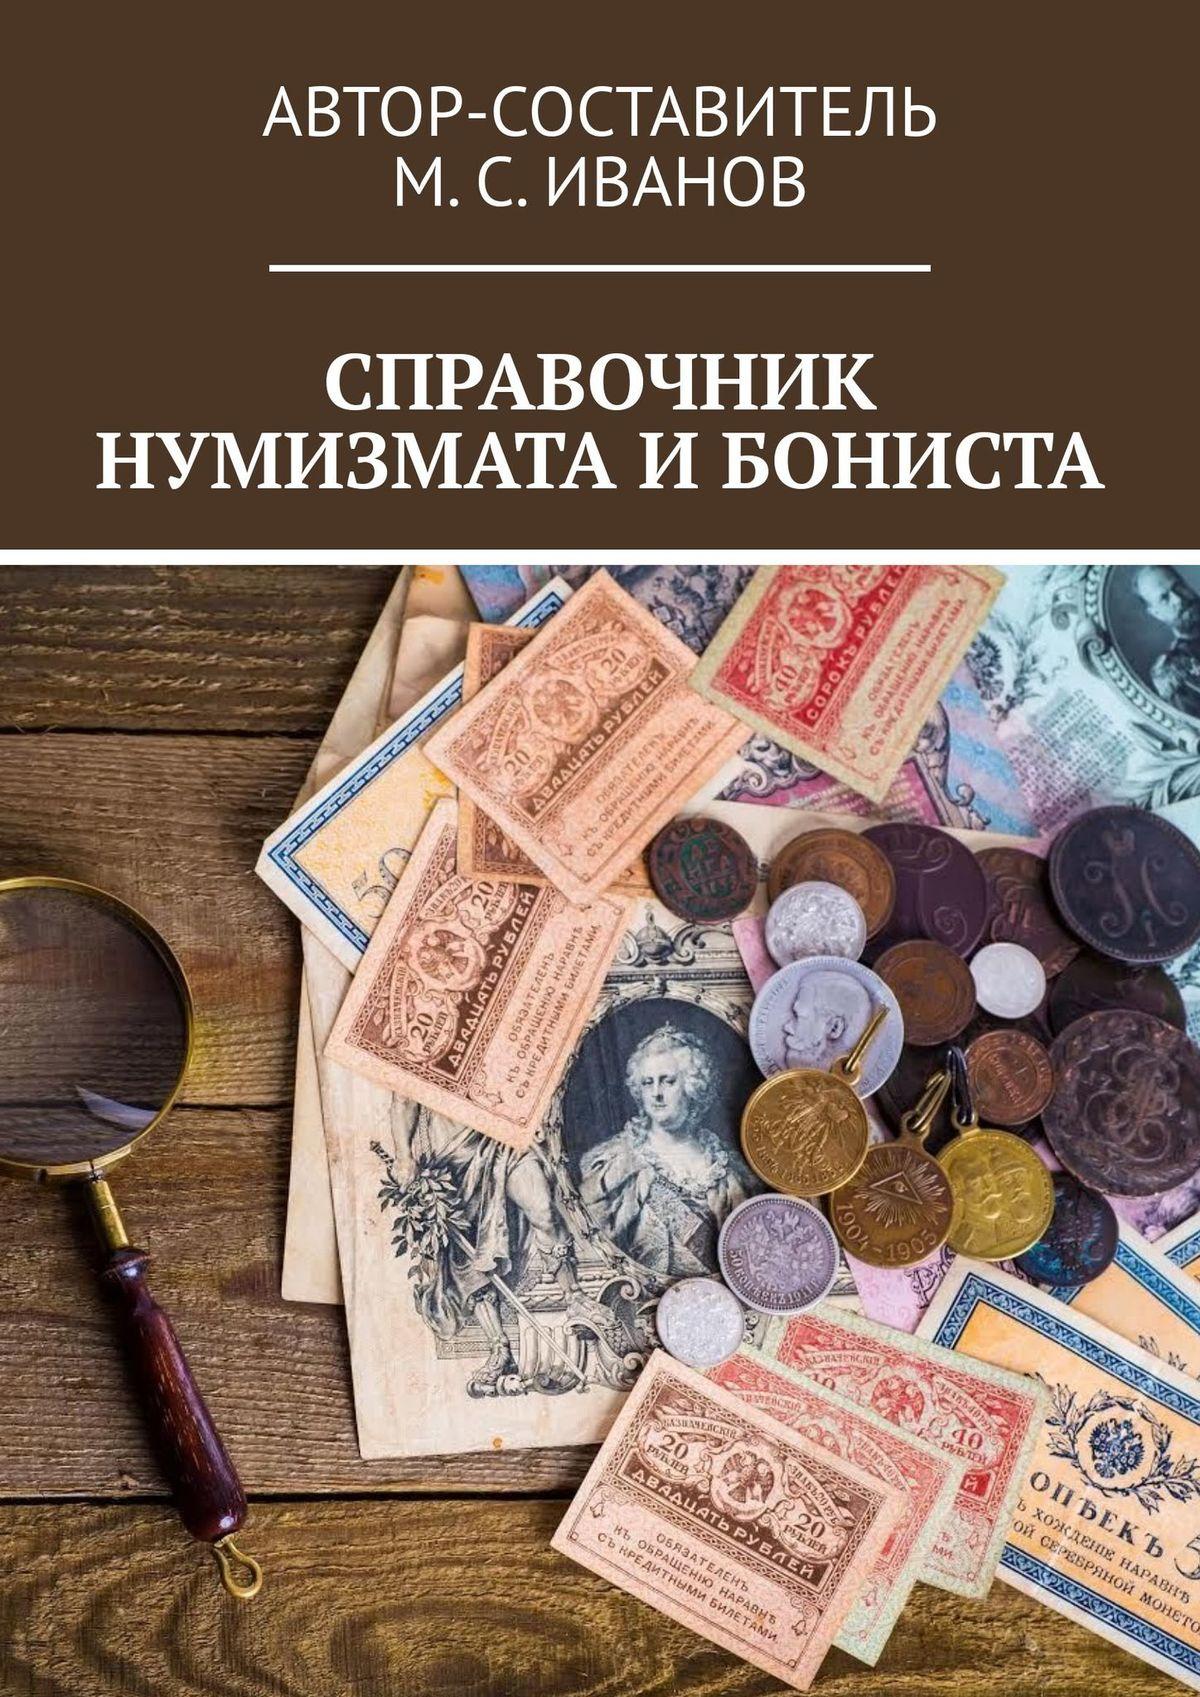 Справочник нумизмата ибониста